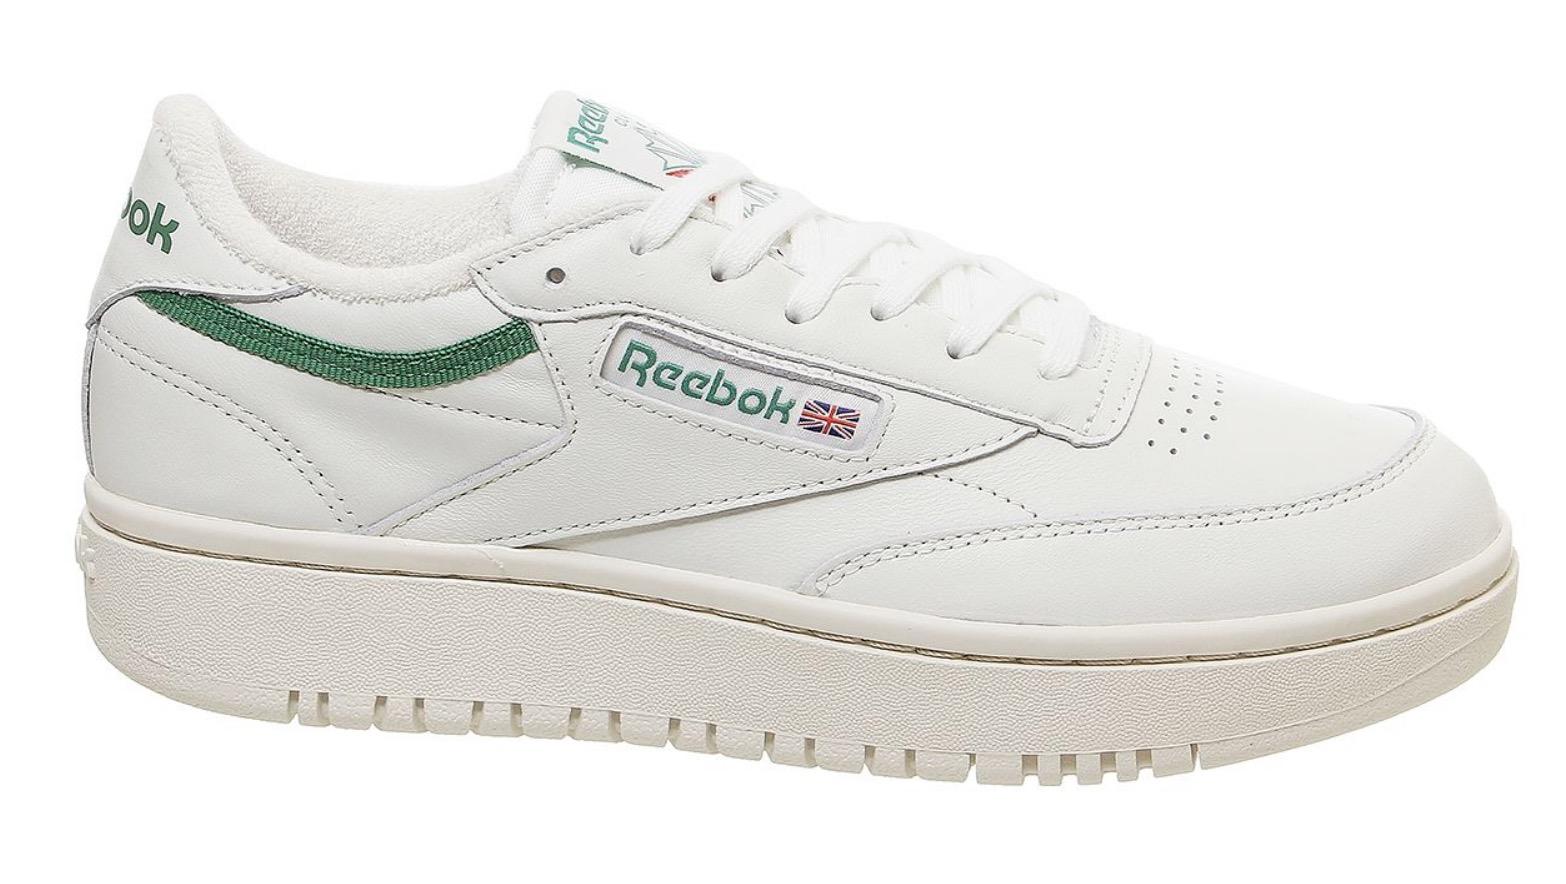 Reebok Club C Double White Green